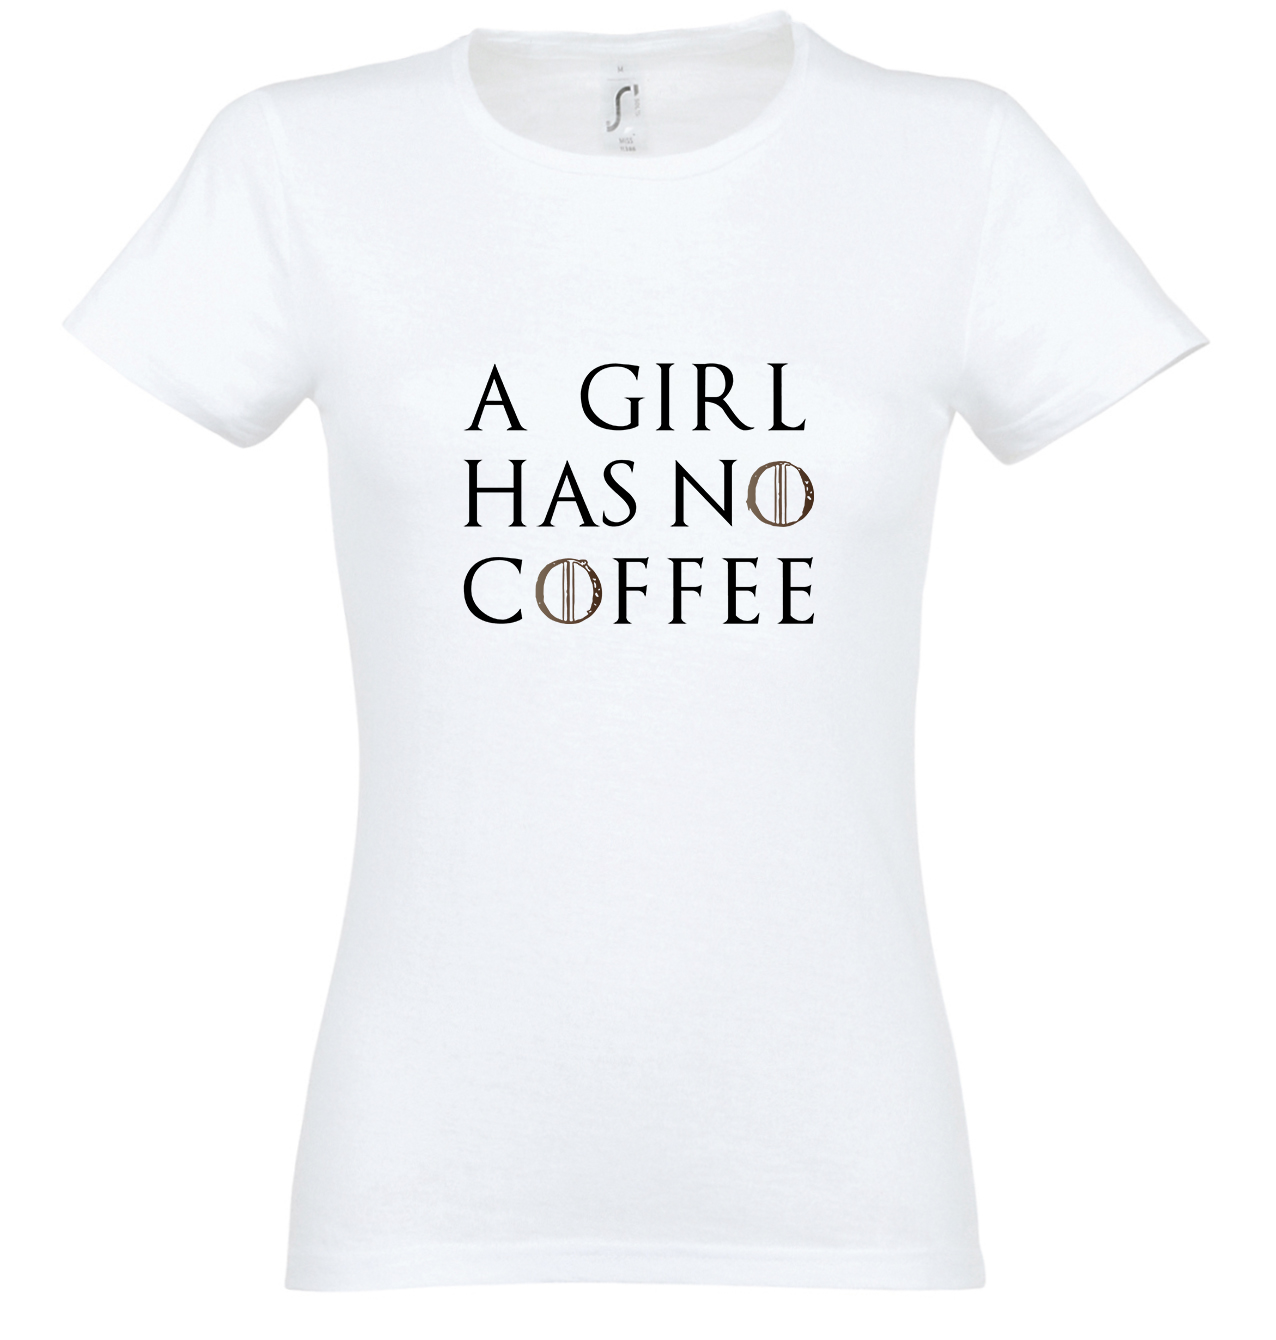 A girl has no coffee